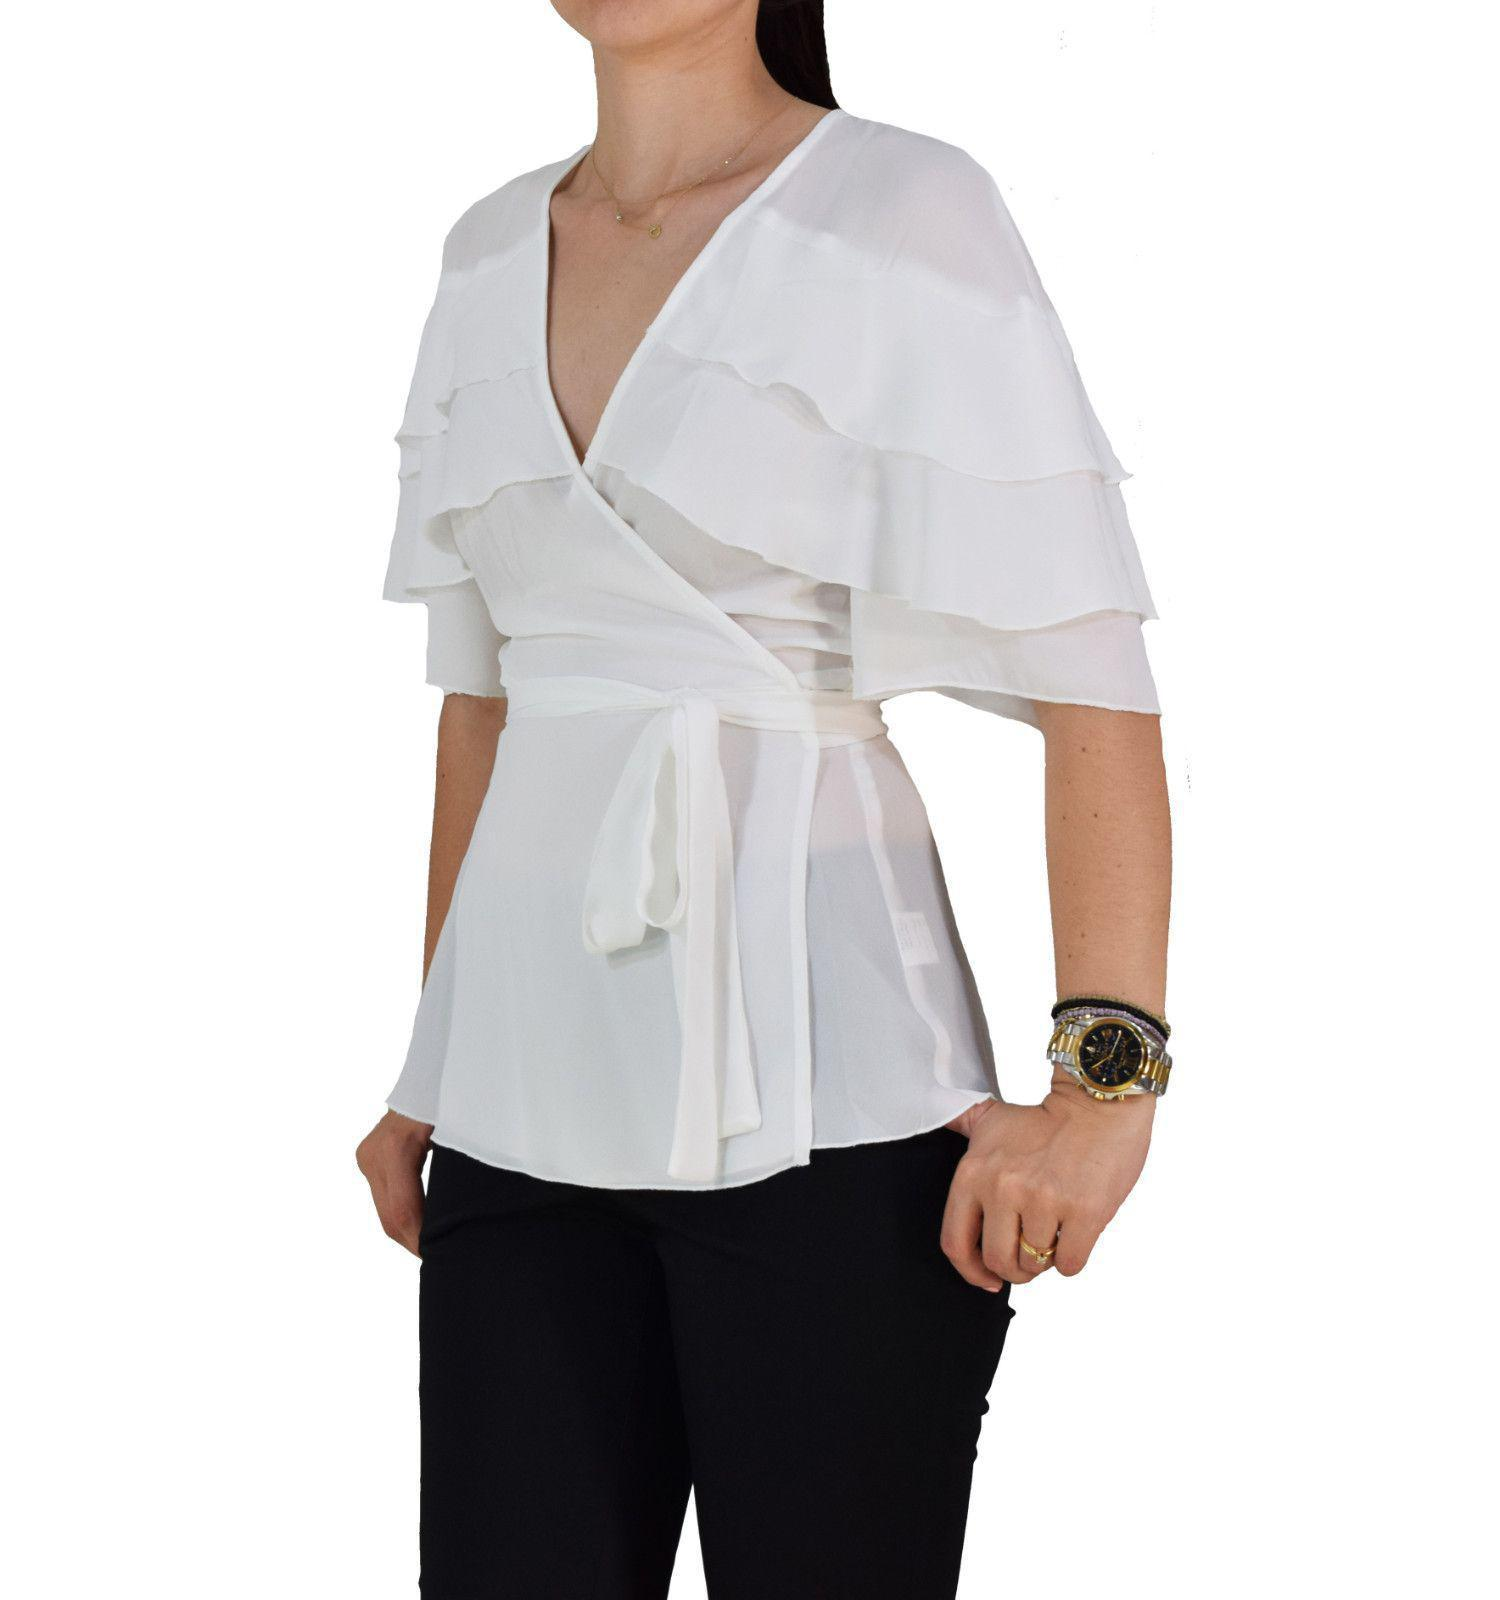 baa3fe500880 Γυναικεία Μπλούζα Κρουαζέ Με Βολάν My T S18T4221 Λευκή